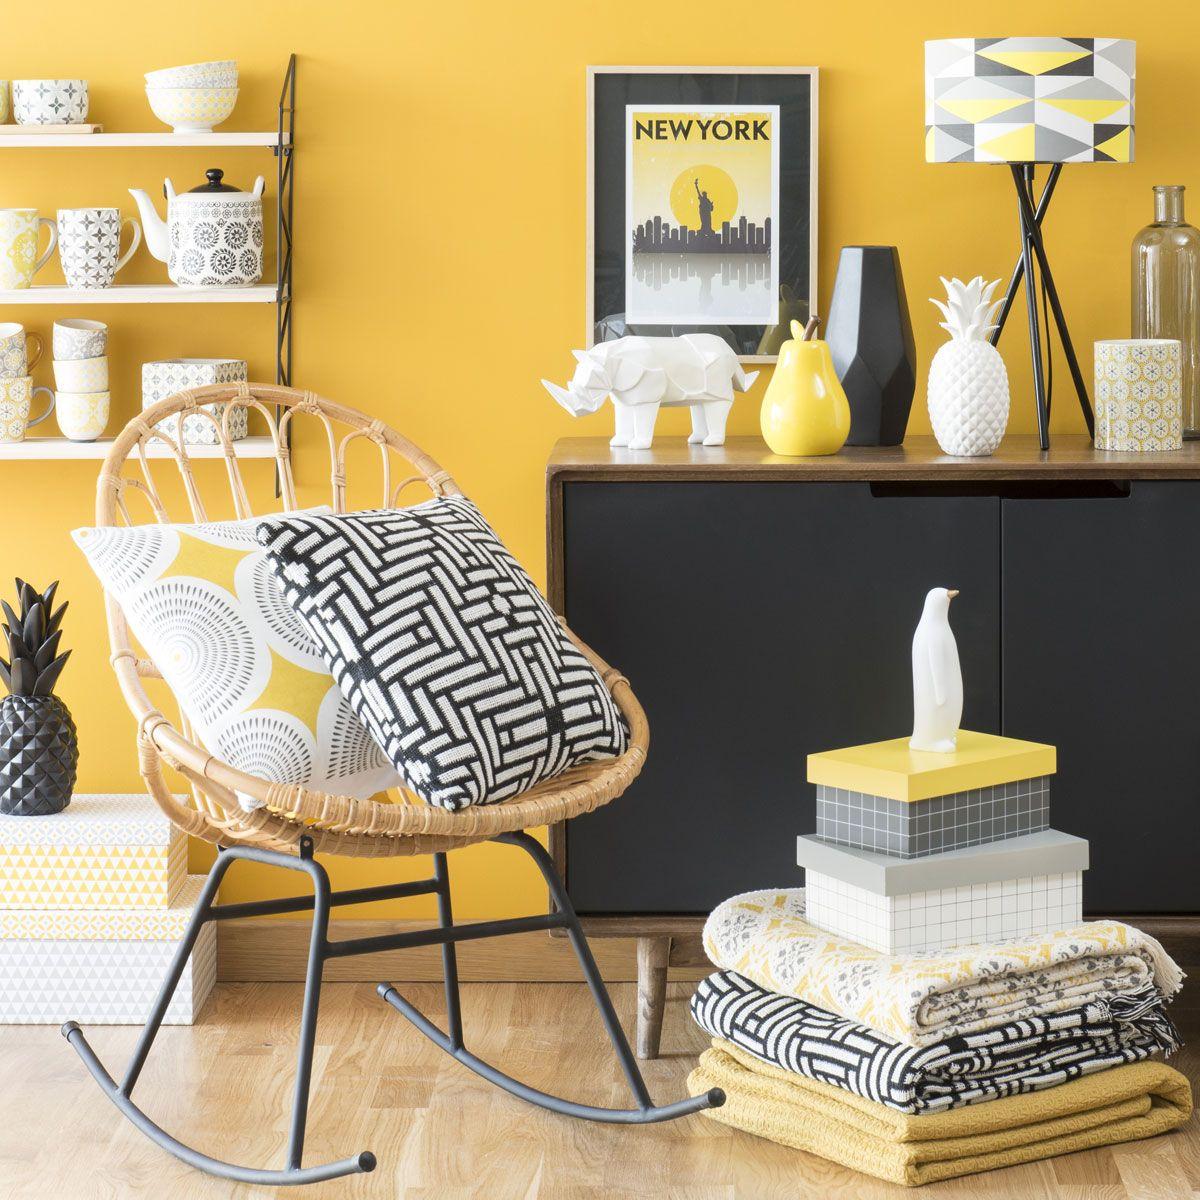 Stunning Chambre Scandinave Jaune Pictures - Design Trends 2017 ...